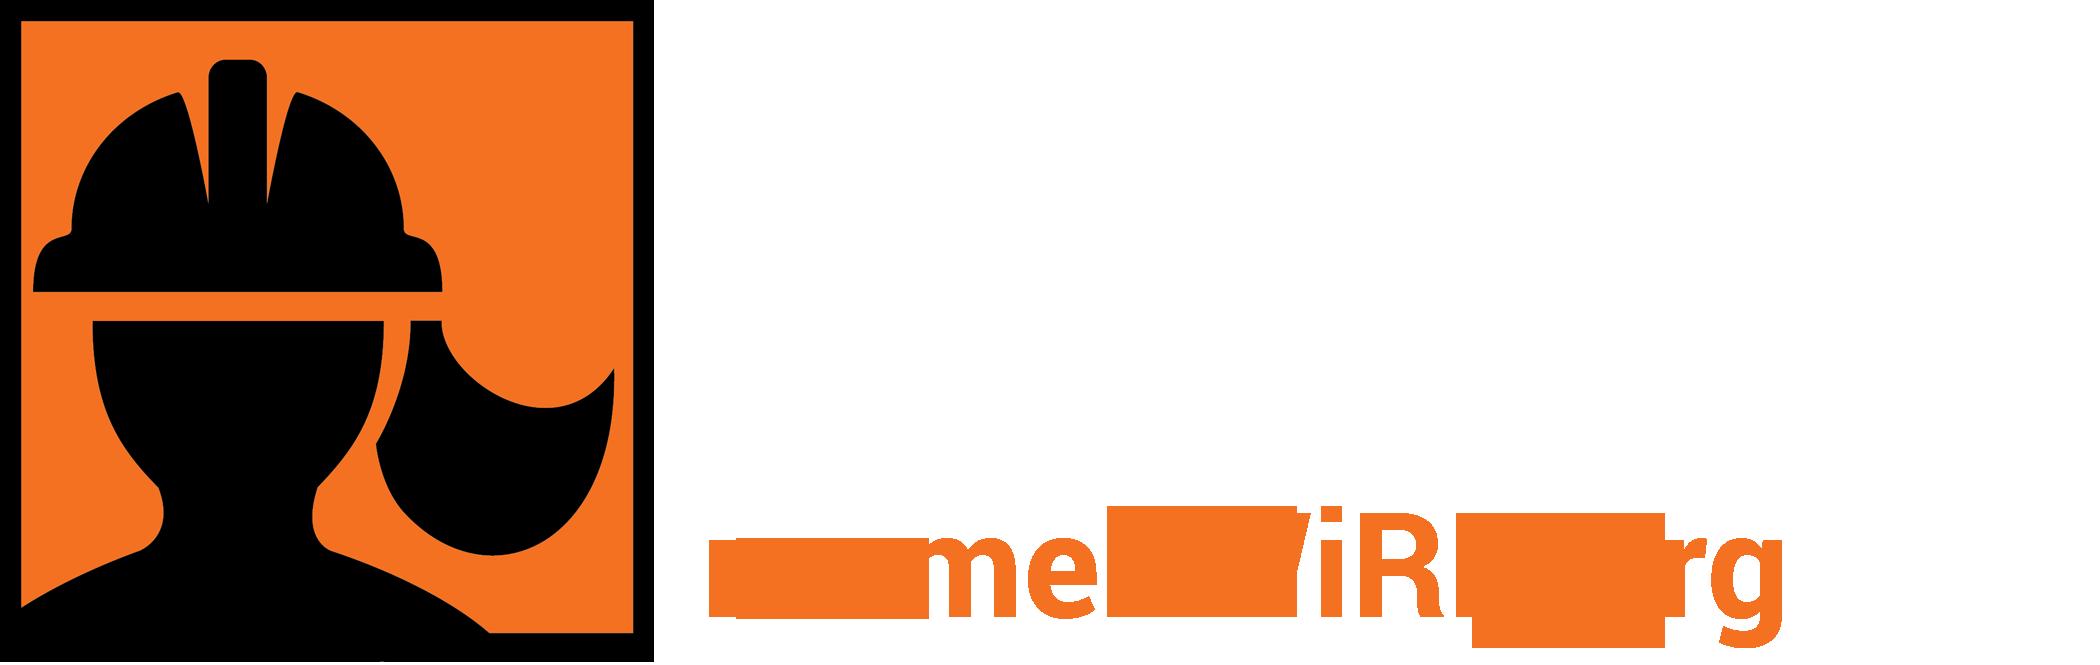 Women in Restoration & Engineering